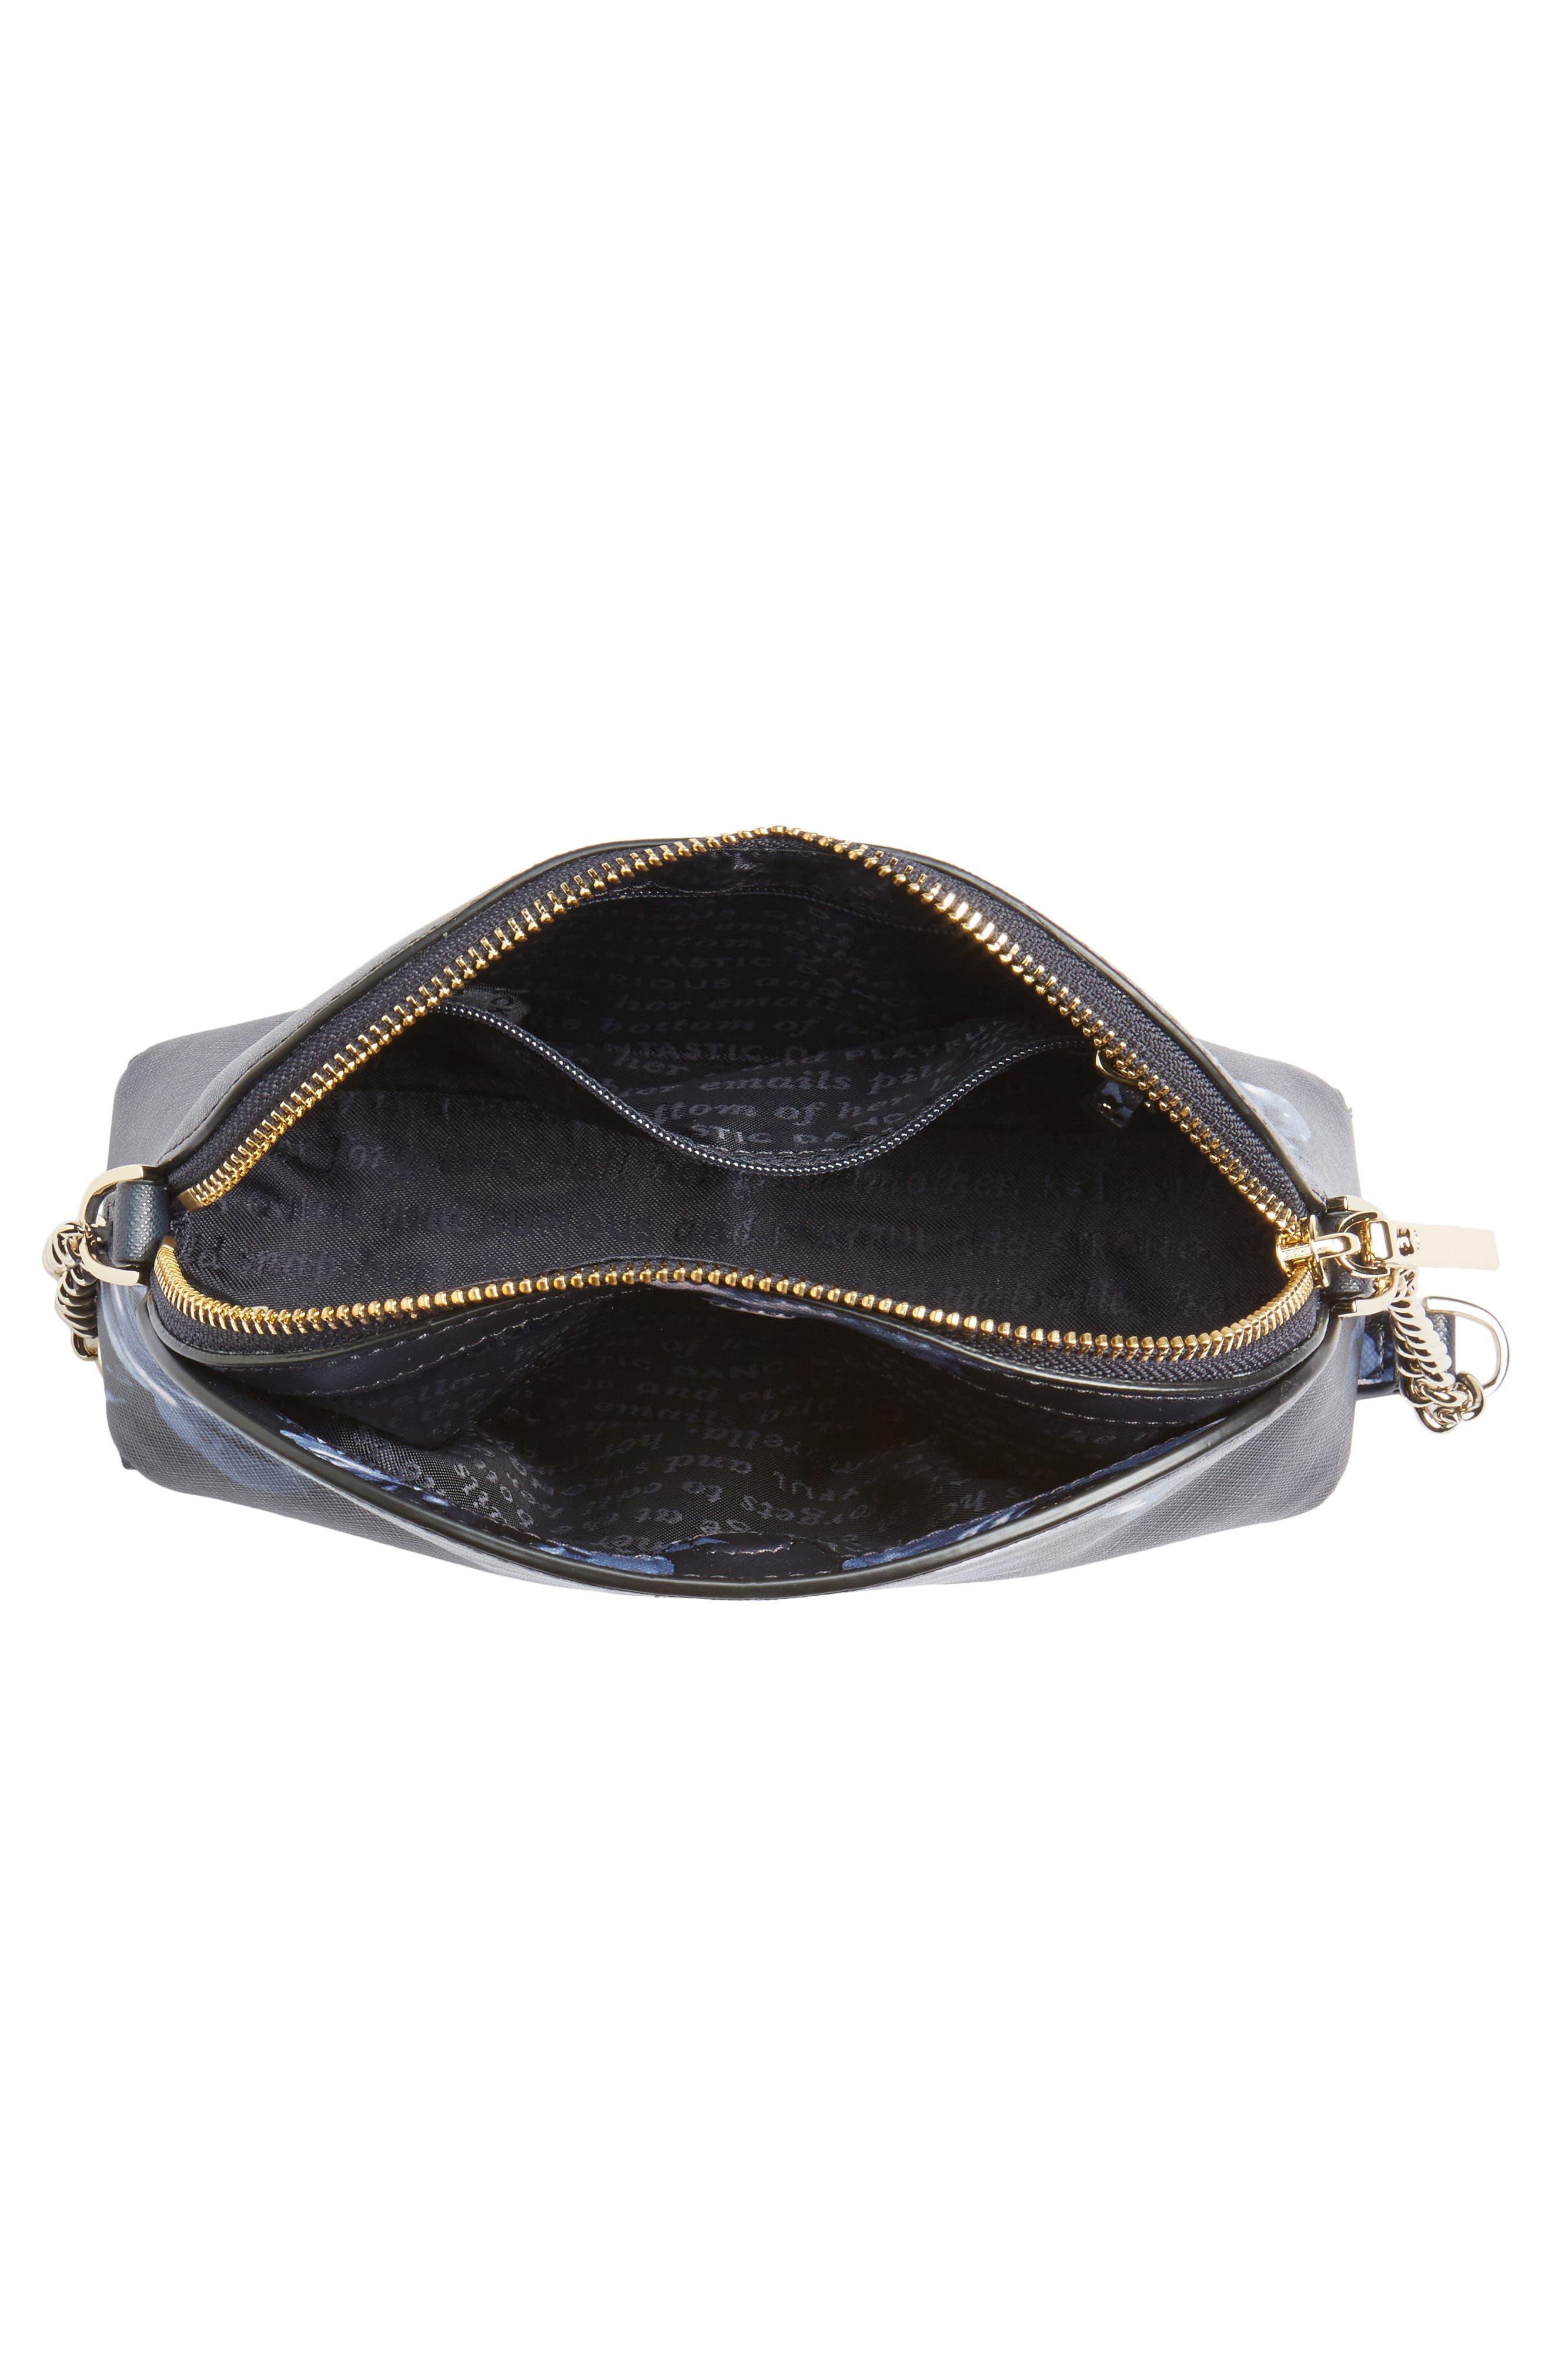 cameron street rose - hilli leather crossbody bag,                             Alternate thumbnail 4, color,                             458